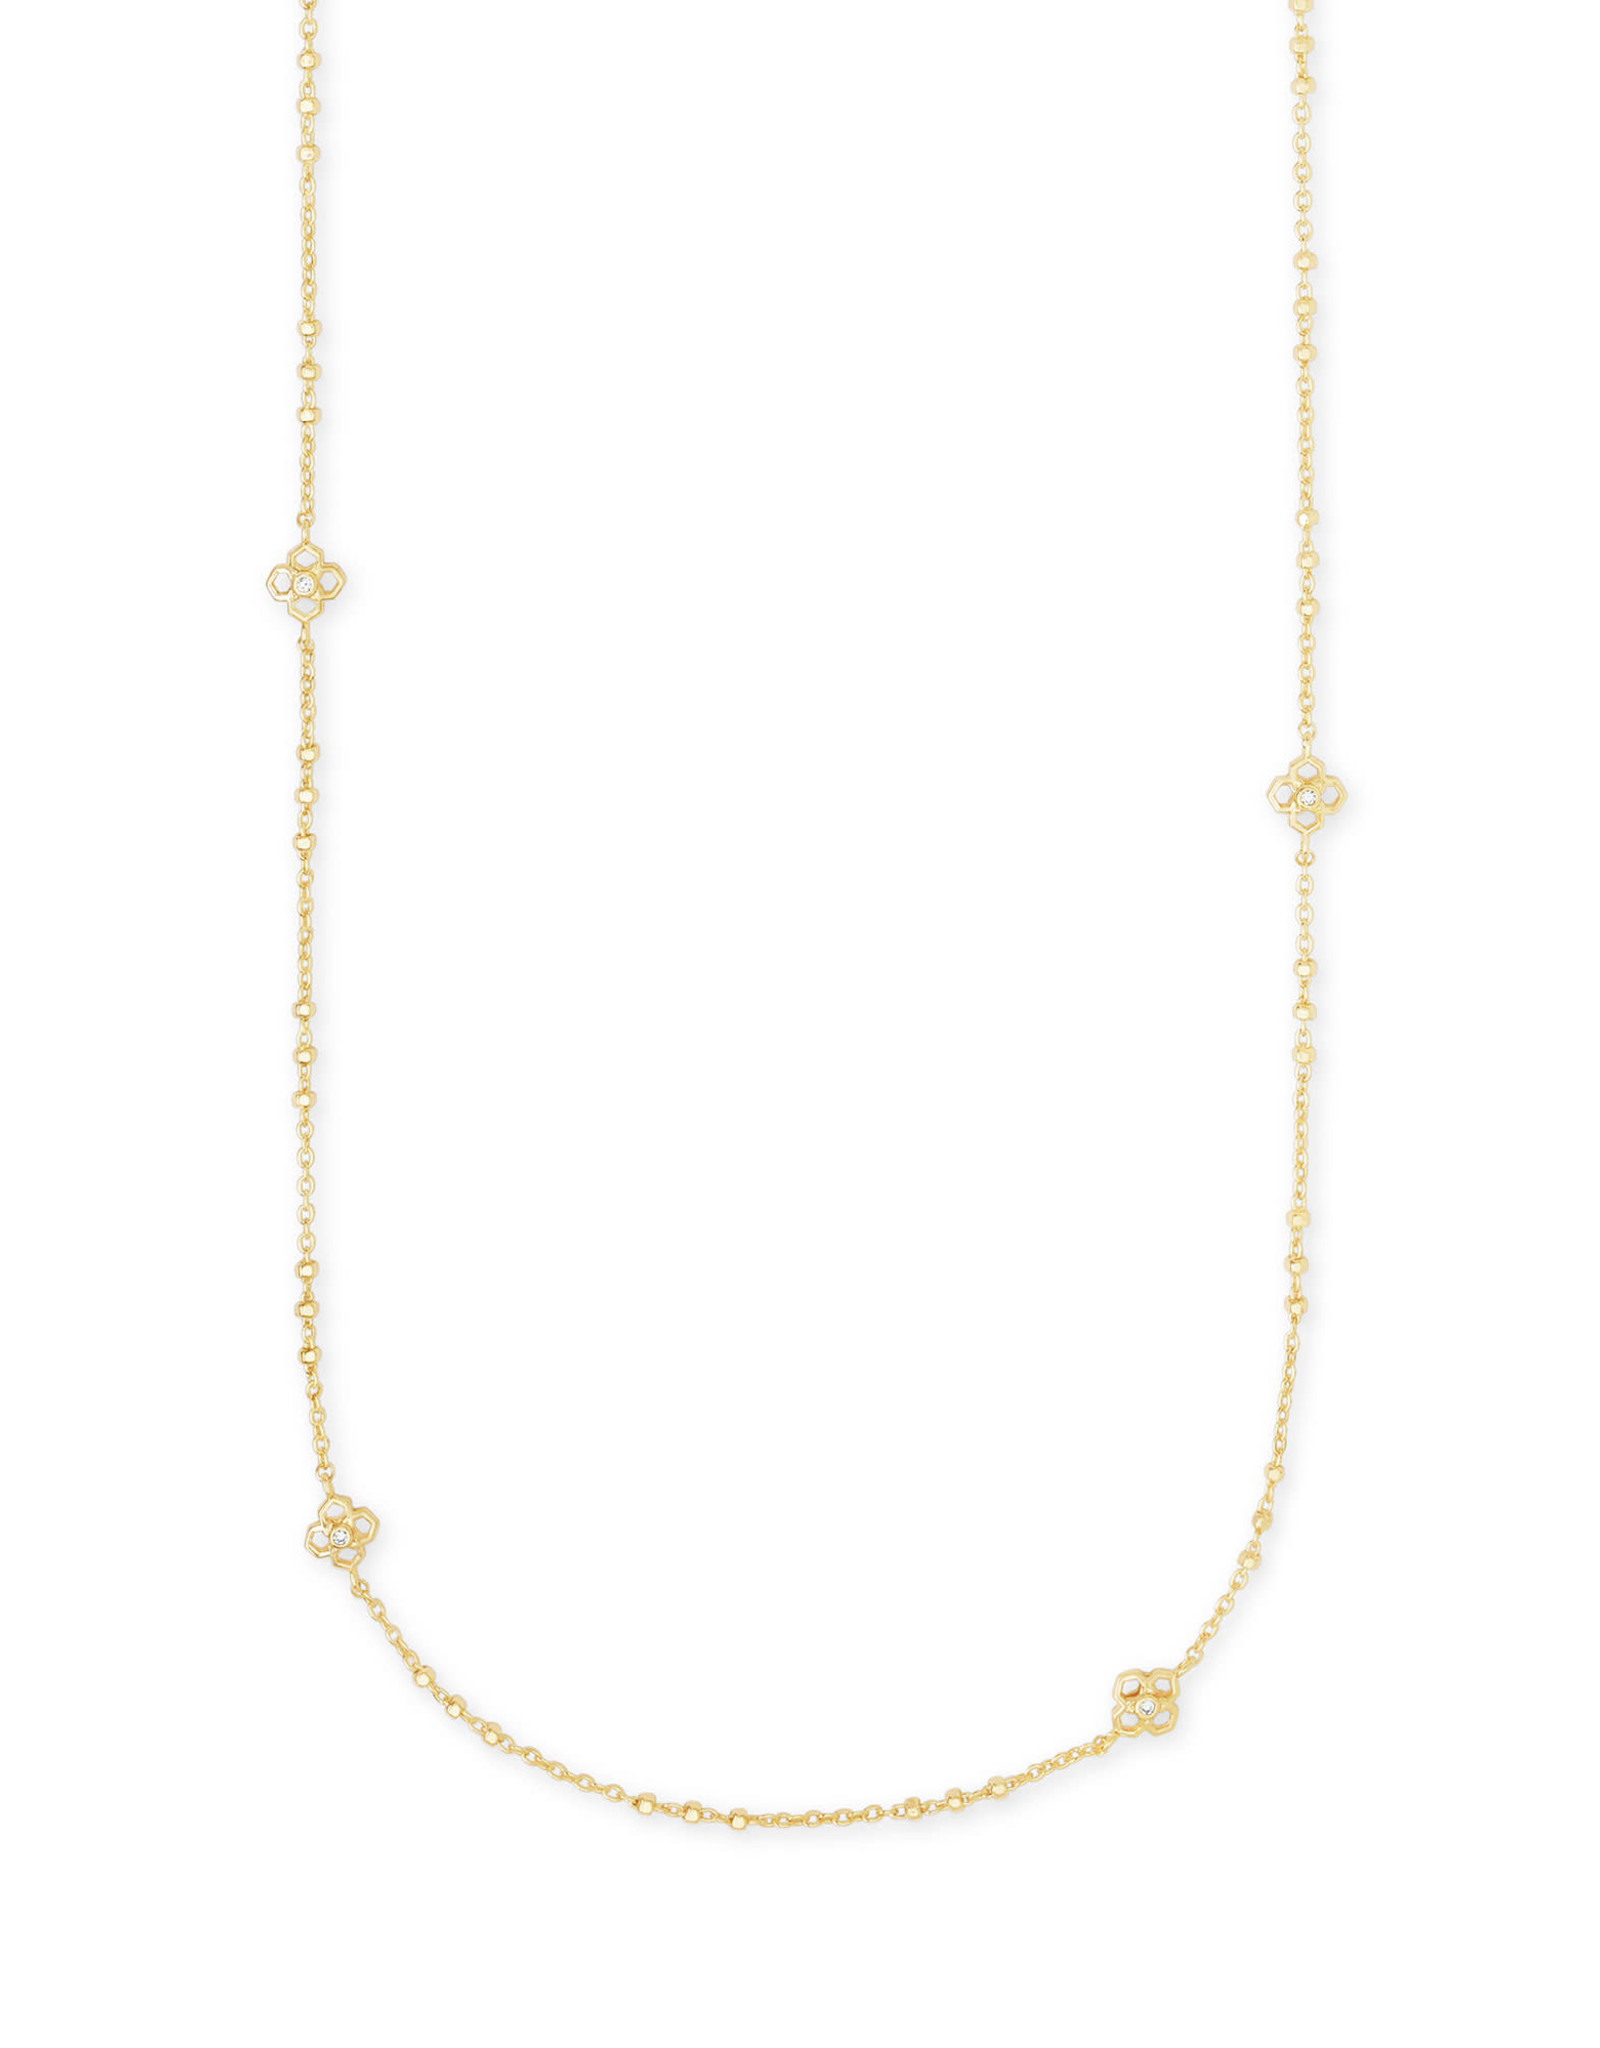 Kendra Scott Rue Long Strand Necklace - Gold Metal